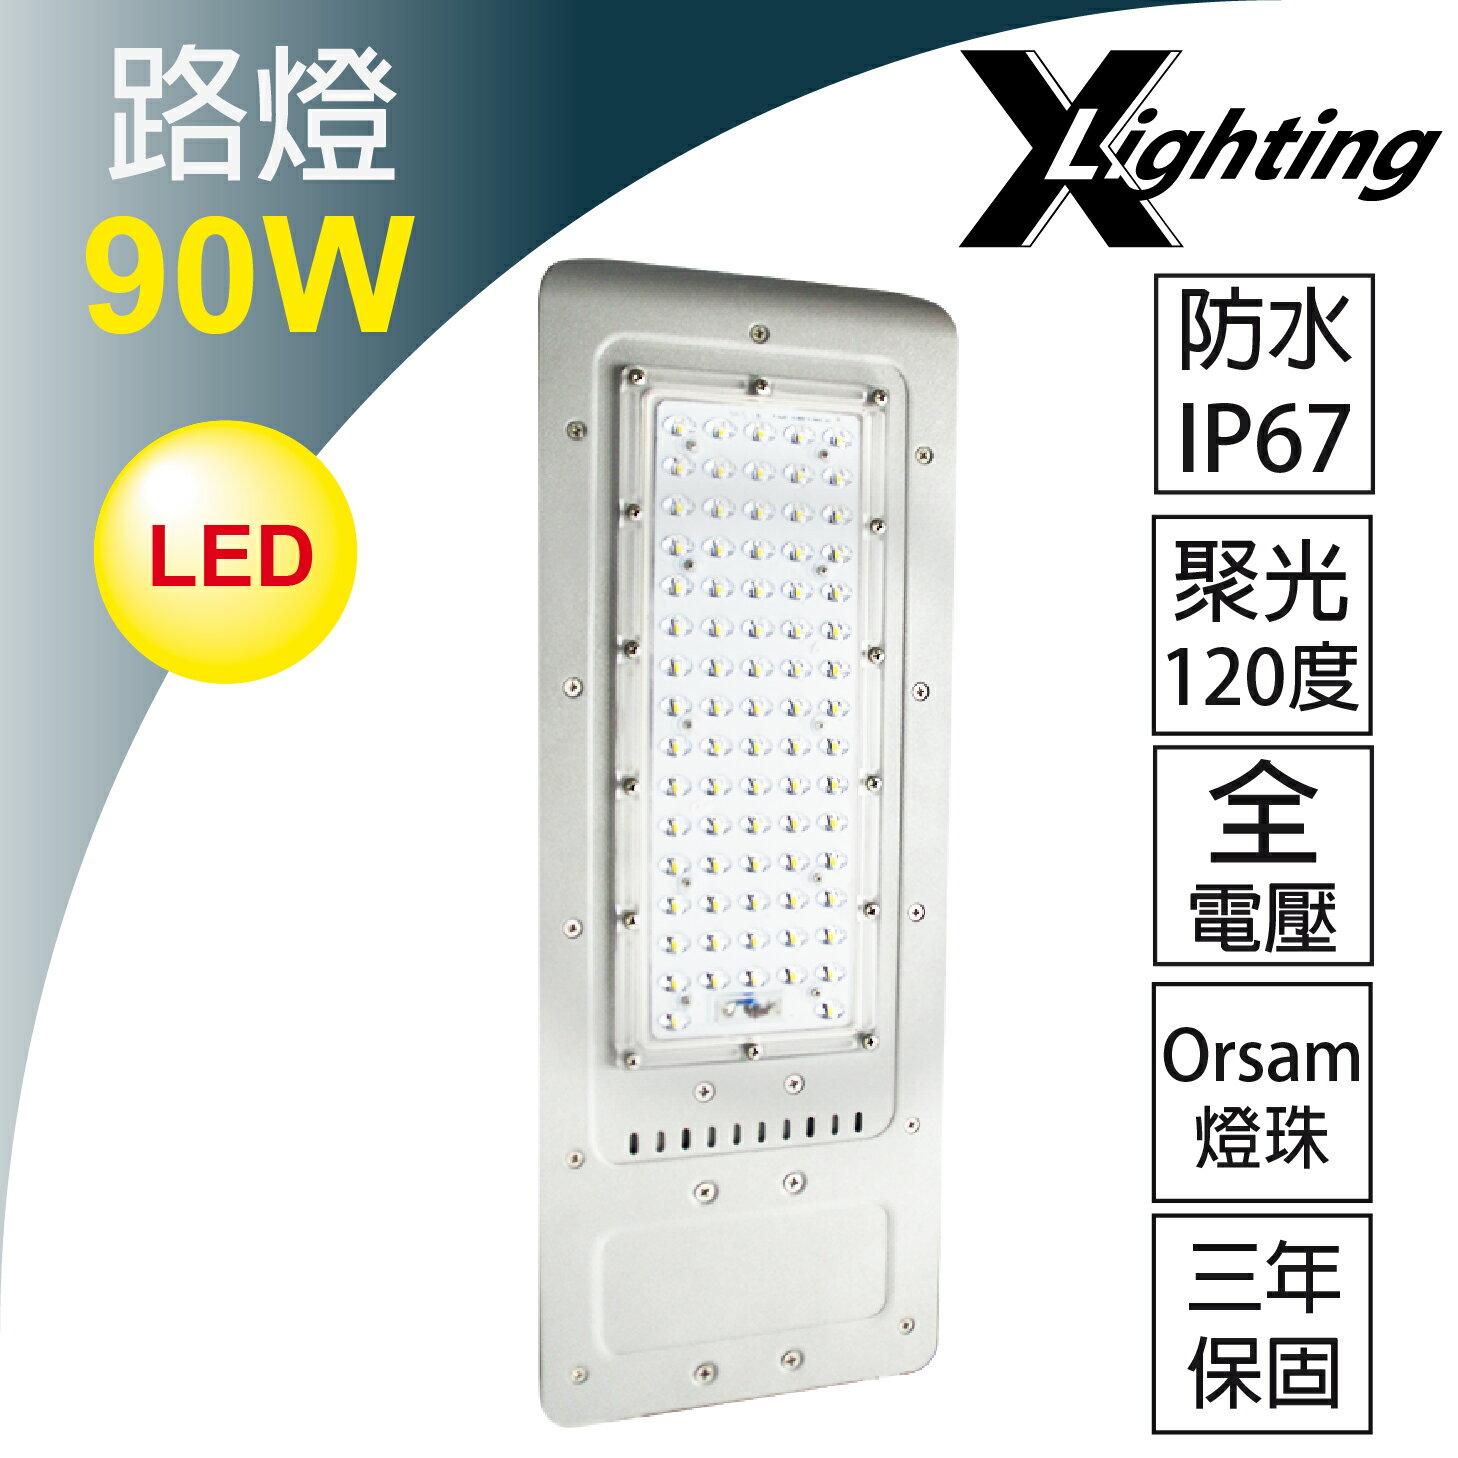 LED 路燈 90W 白光 Osram燈珠 防水3年保固 EXPC X-LIGHTING (50W 100W 150W )